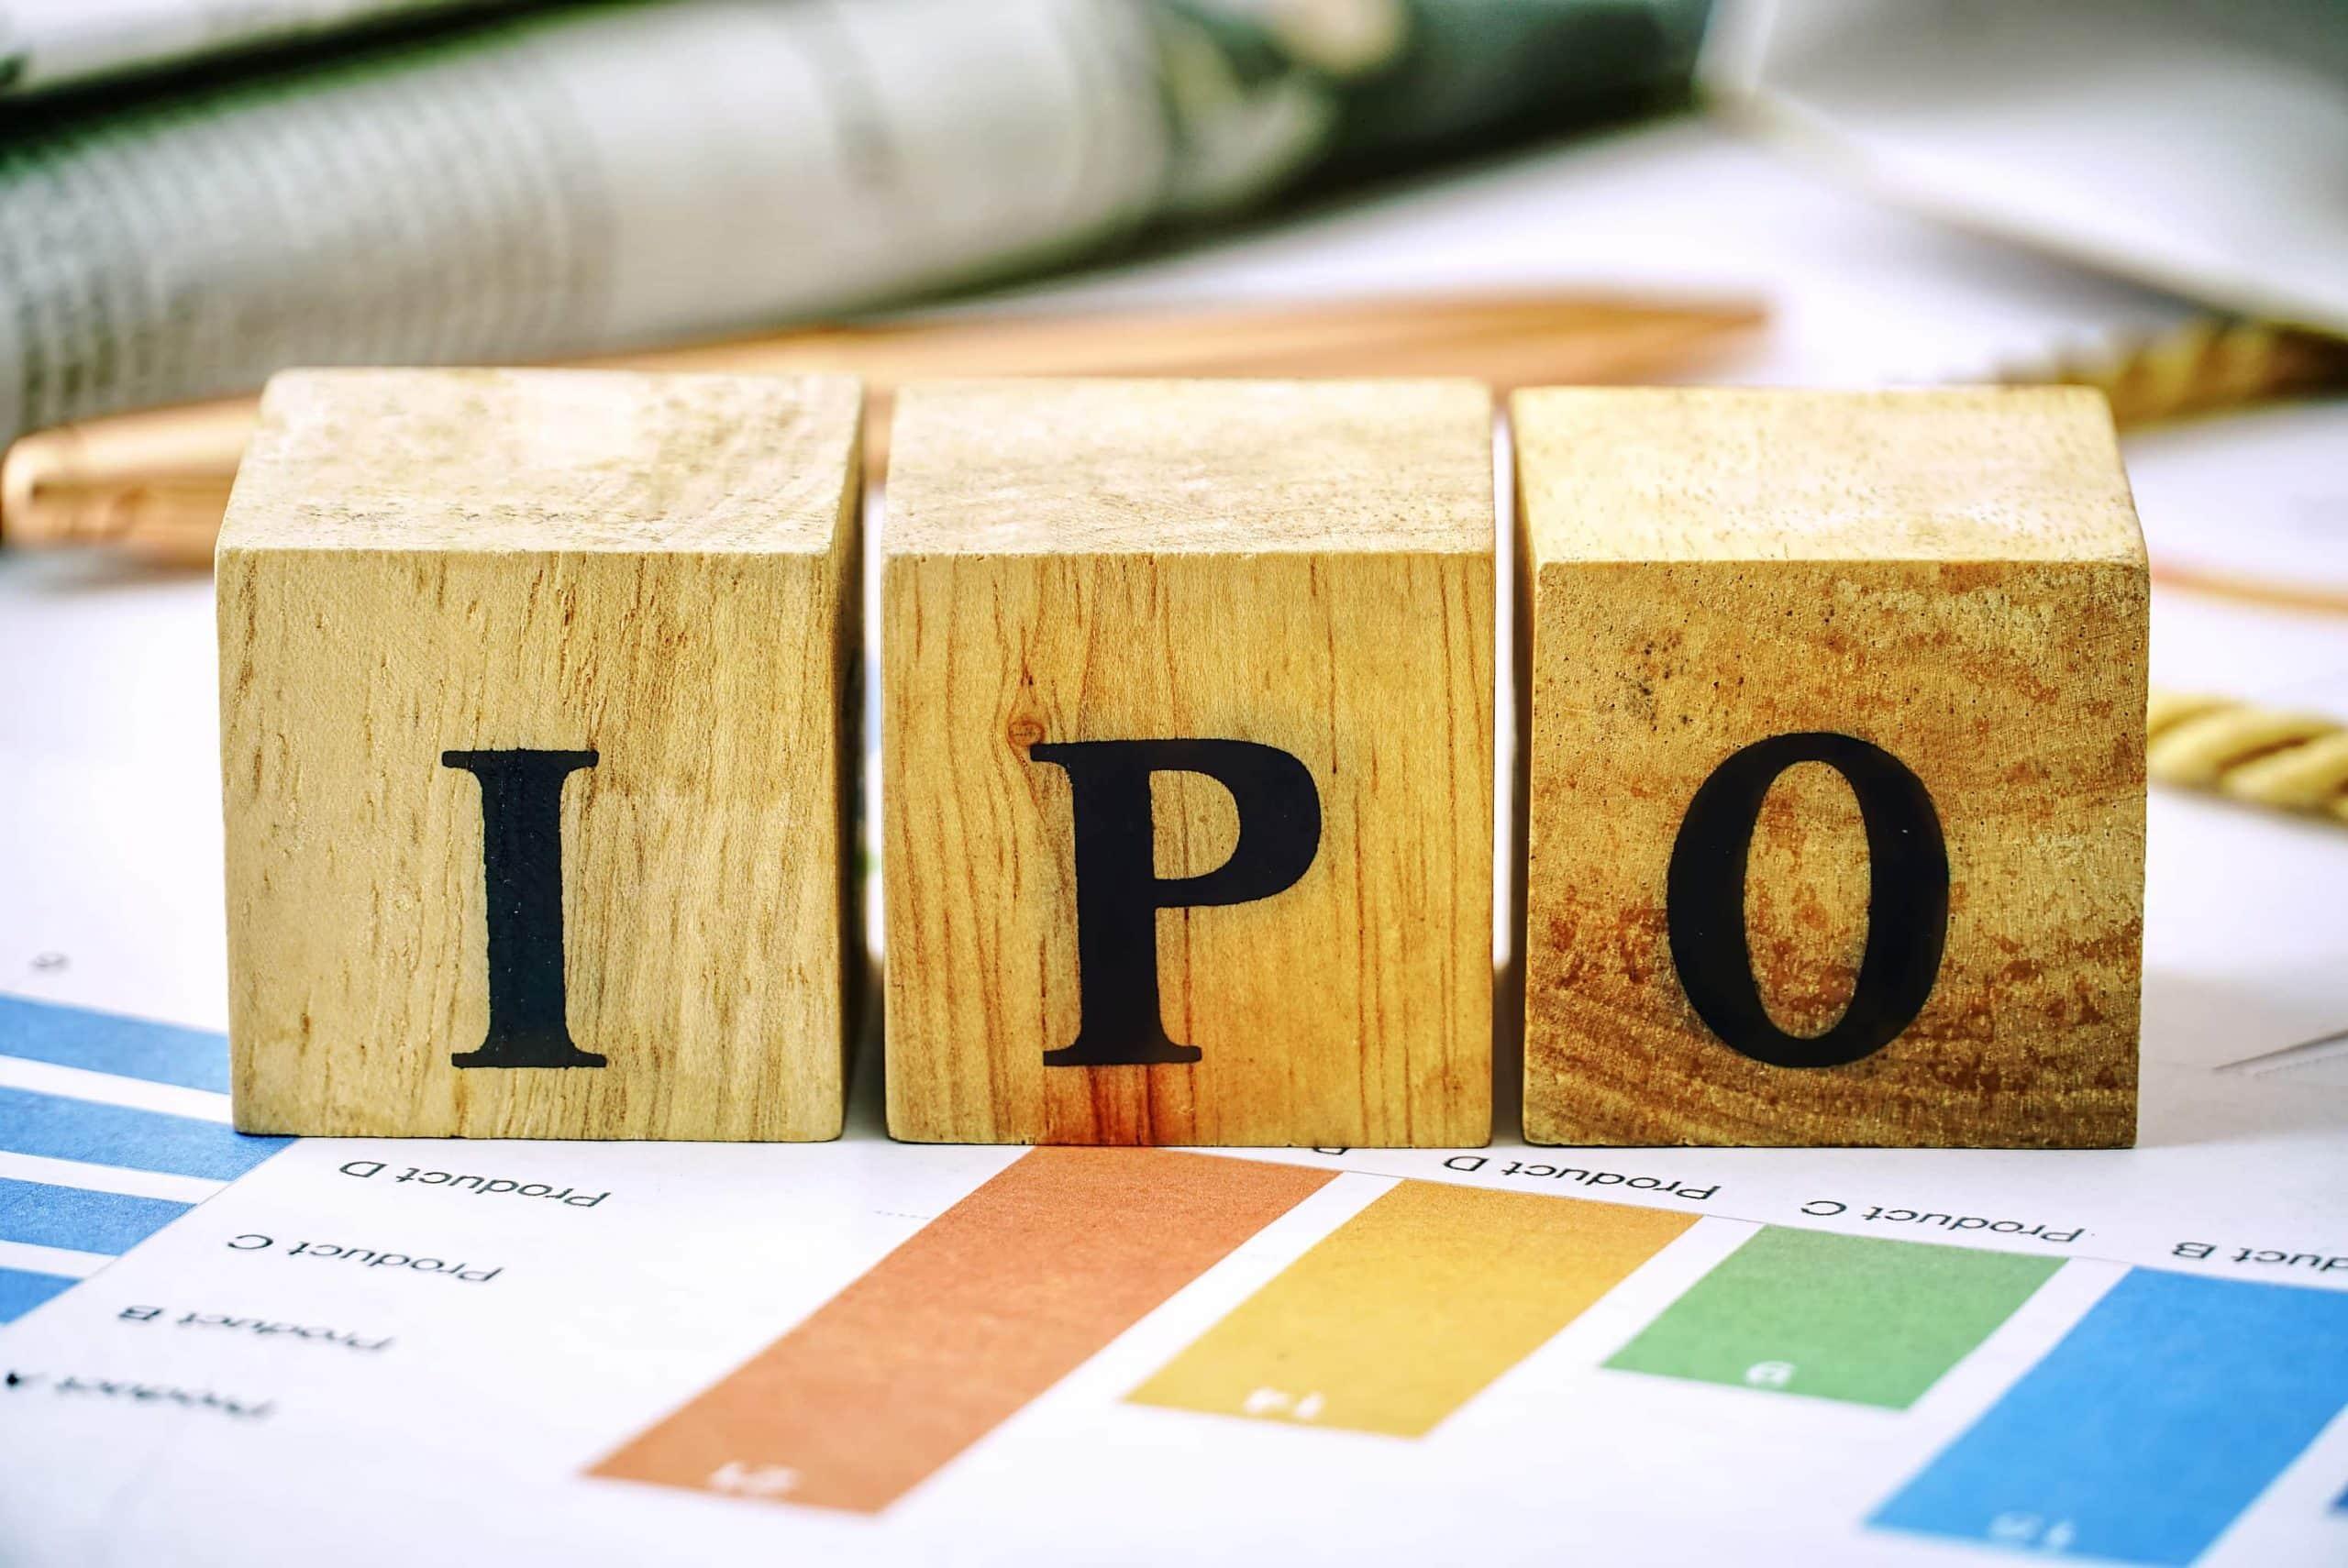 Börsengang (IPO)